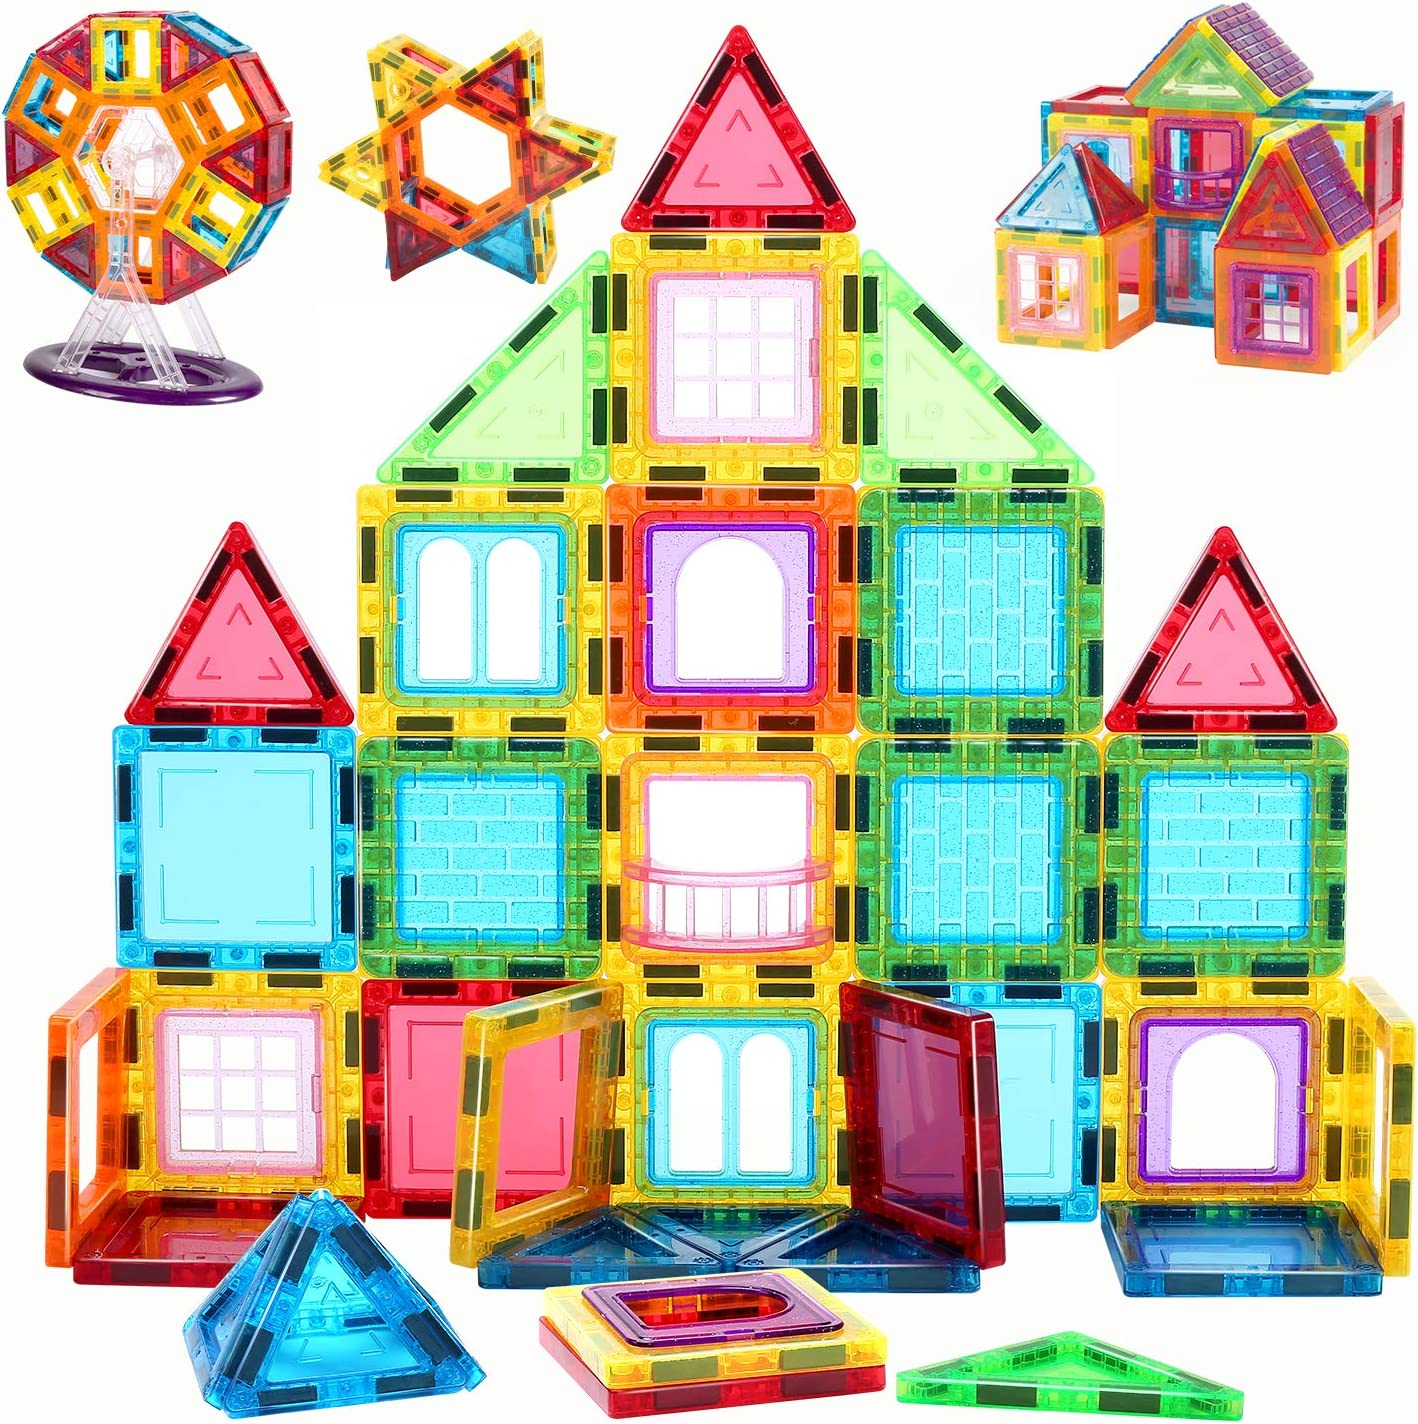 CUTE STONE Kids Magnet Toys, Magnet Building Tiles,3D Magnetic Building Blocks Set for Toddlers Children Magnetic Educational Toys 70 Pieces